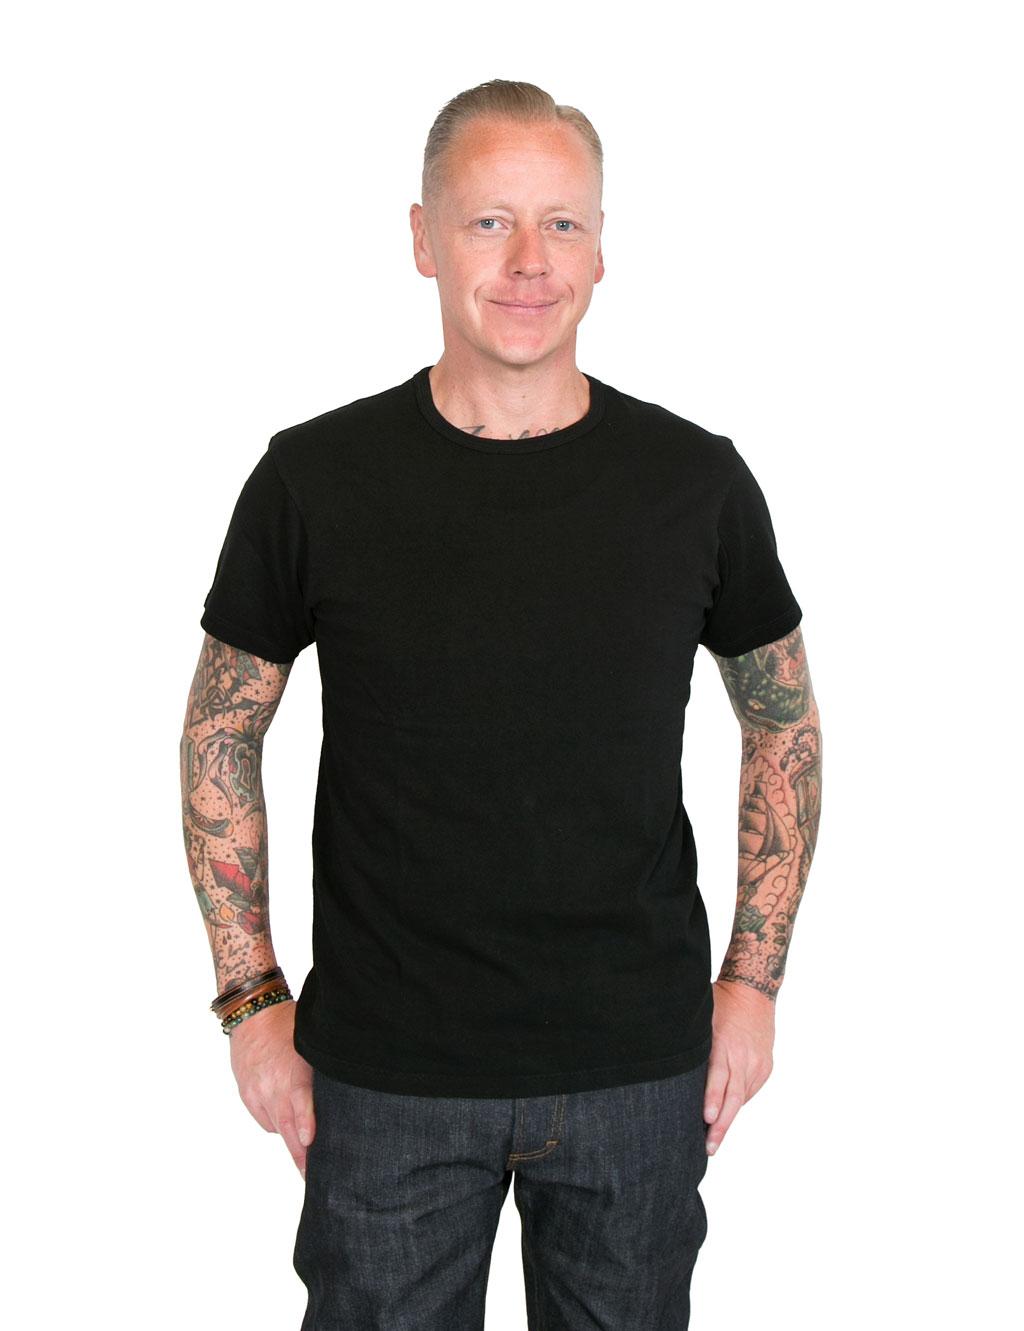 White t shirt company - Lady White Co Our Black T Shirt Black